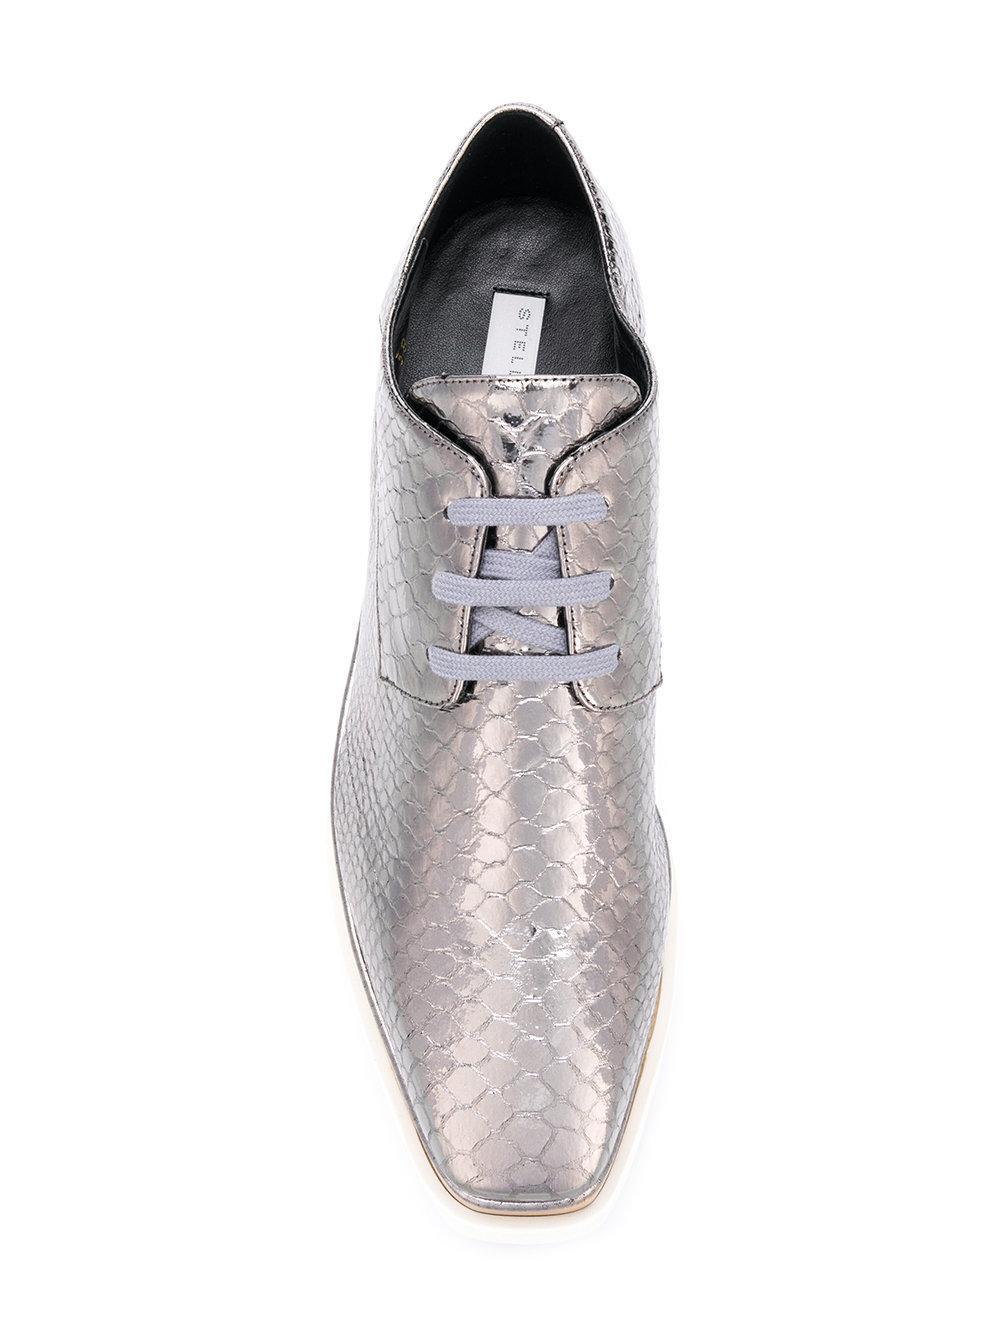 075aefe9fb7 Lyst - Stella McCartney Platform Elyse Shoes in Metallic